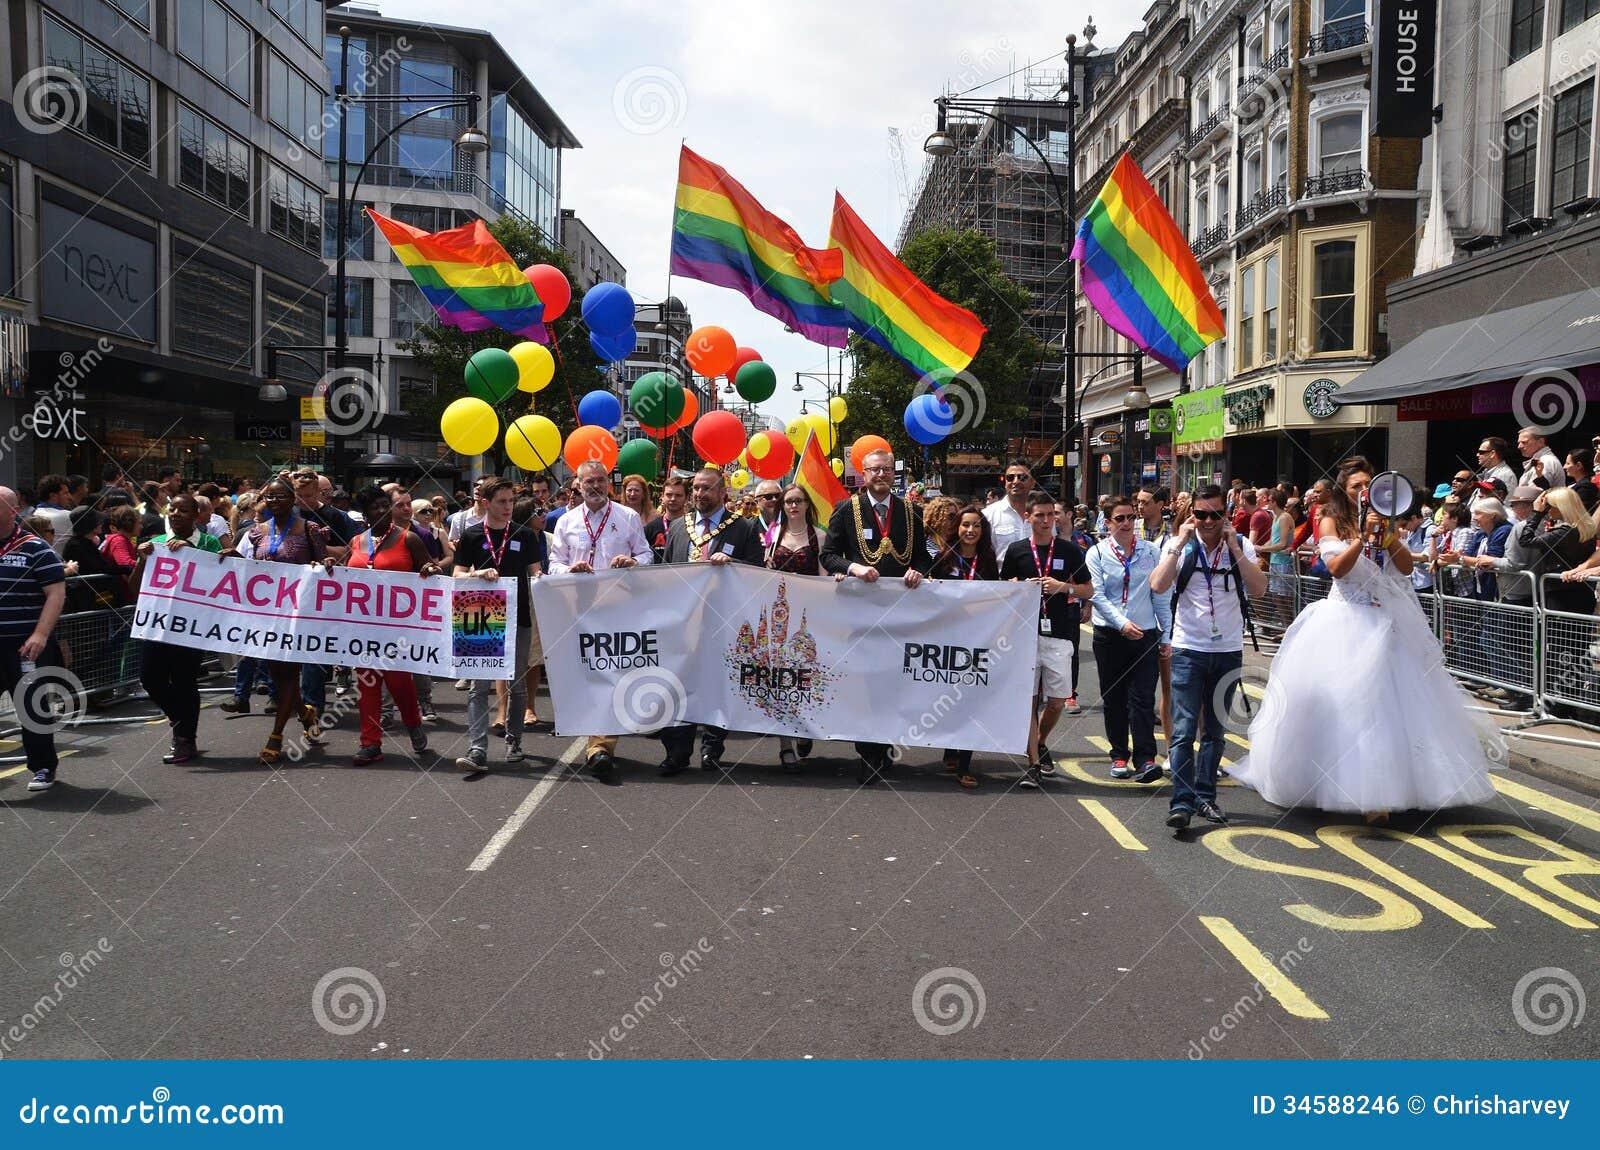 from Caleb gay lesbian oxford